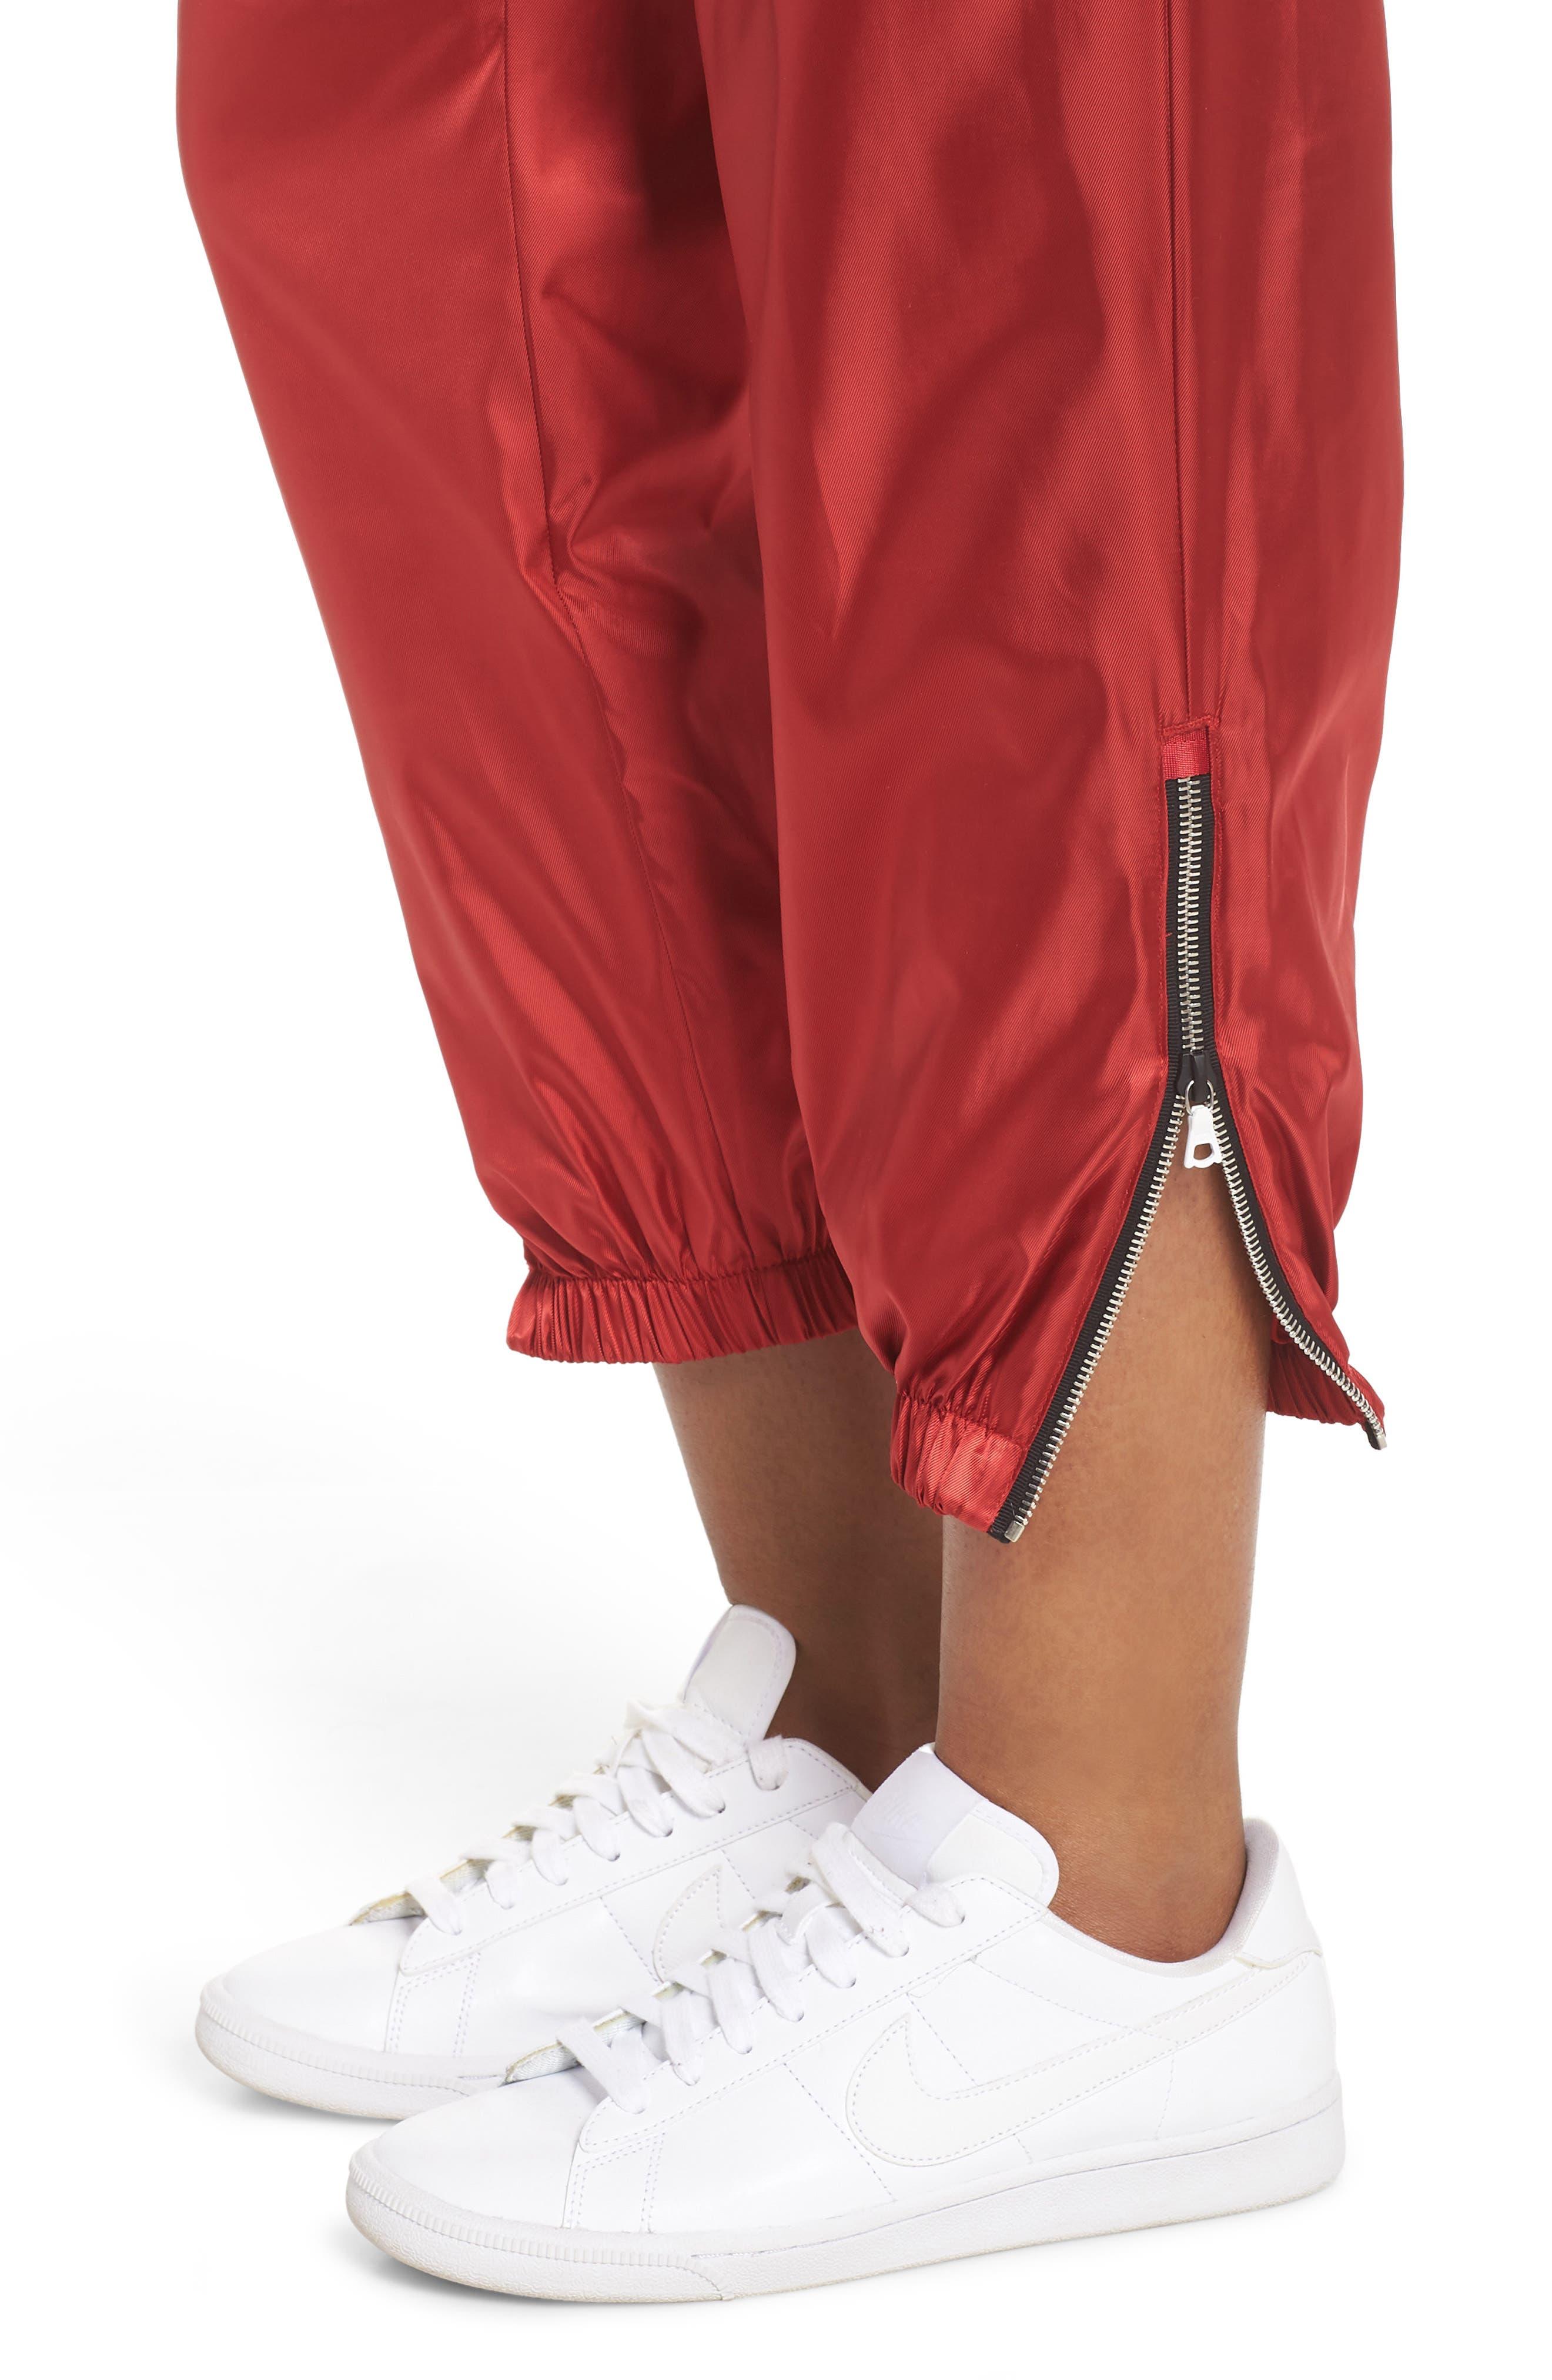 NikeLab Collection Women's Satin Track Pants,                             Alternate thumbnail 4, color,                             600